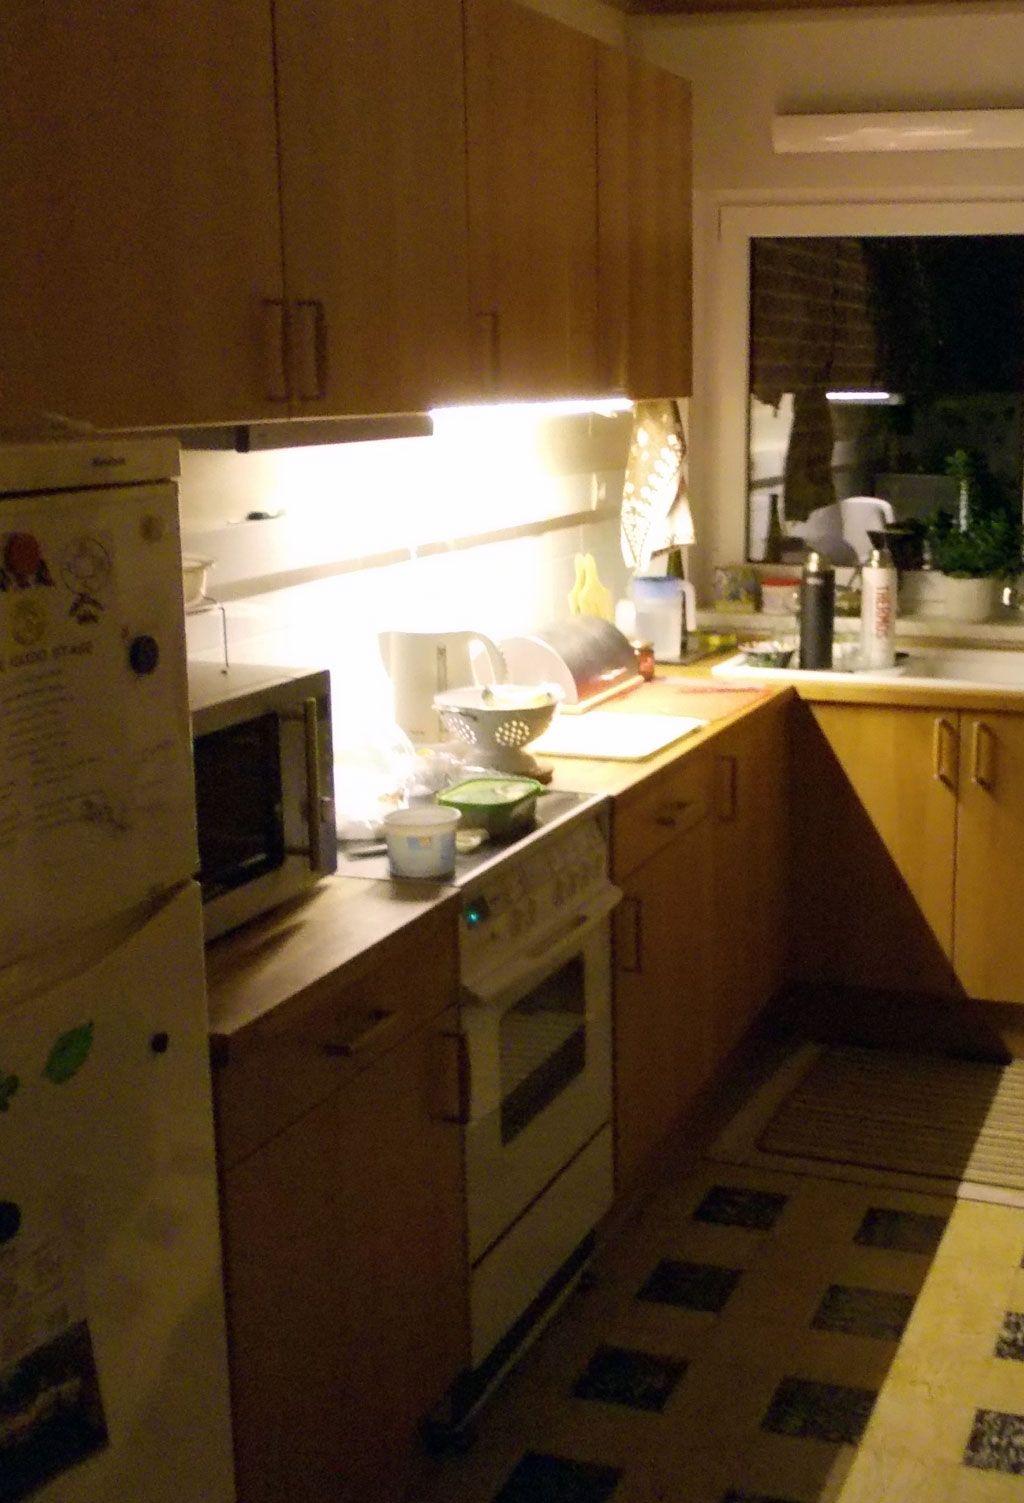 Built In Kitchen Ledberg Ikea Hackers Cheap Kitchen Cabinets Kitchen Cabinets Kitchen Fittings